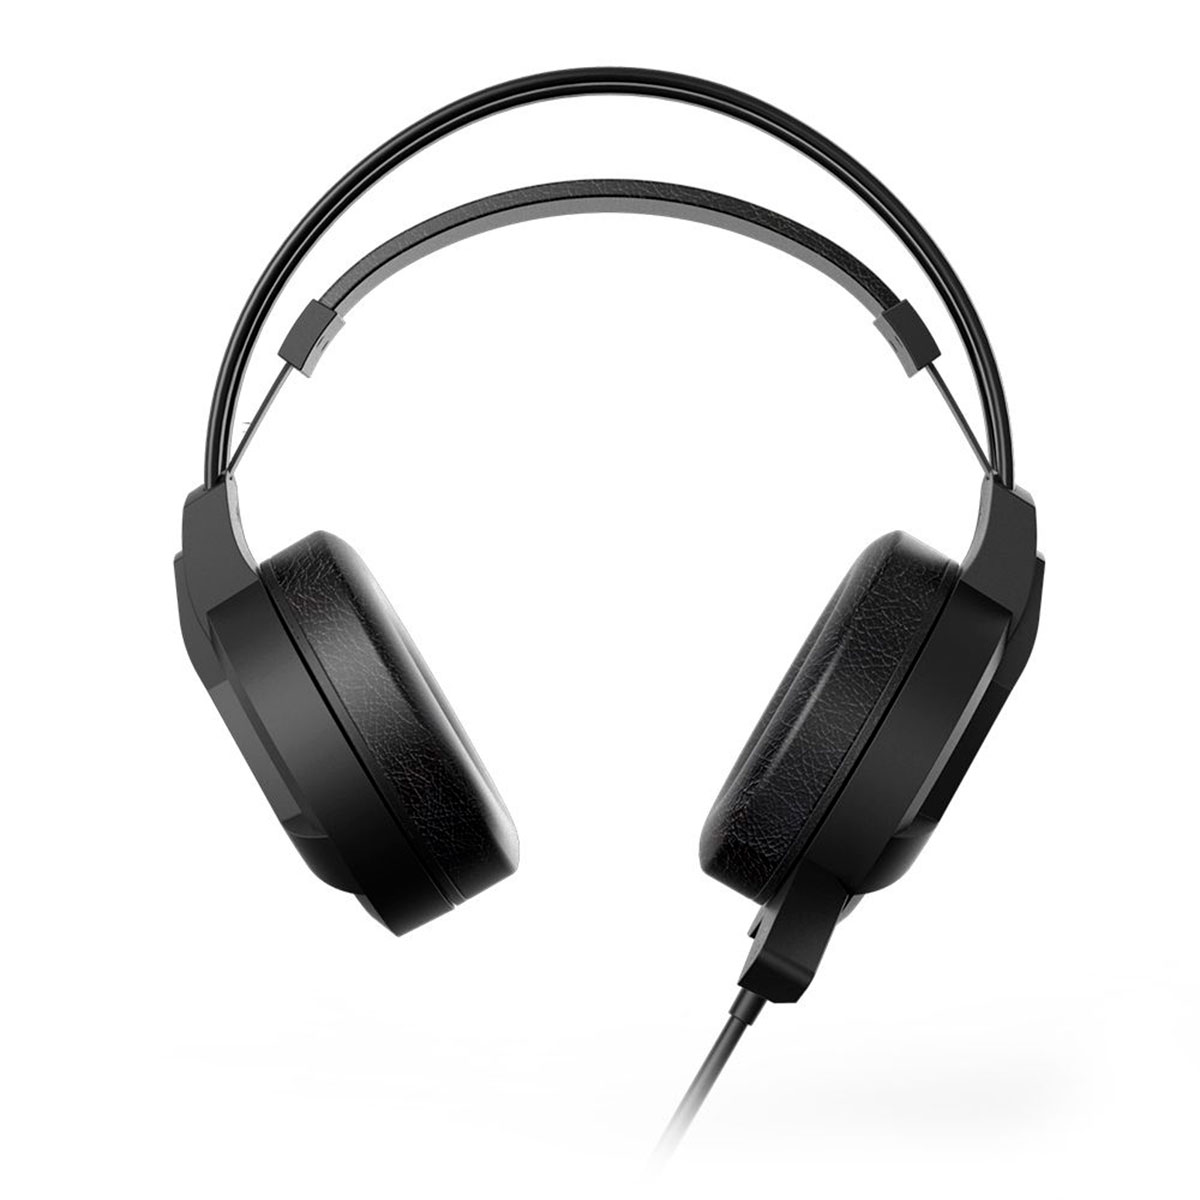 Headset Gamer HP H100, Stereo 2, P2 3.5mm, Driver 50mm, Preto